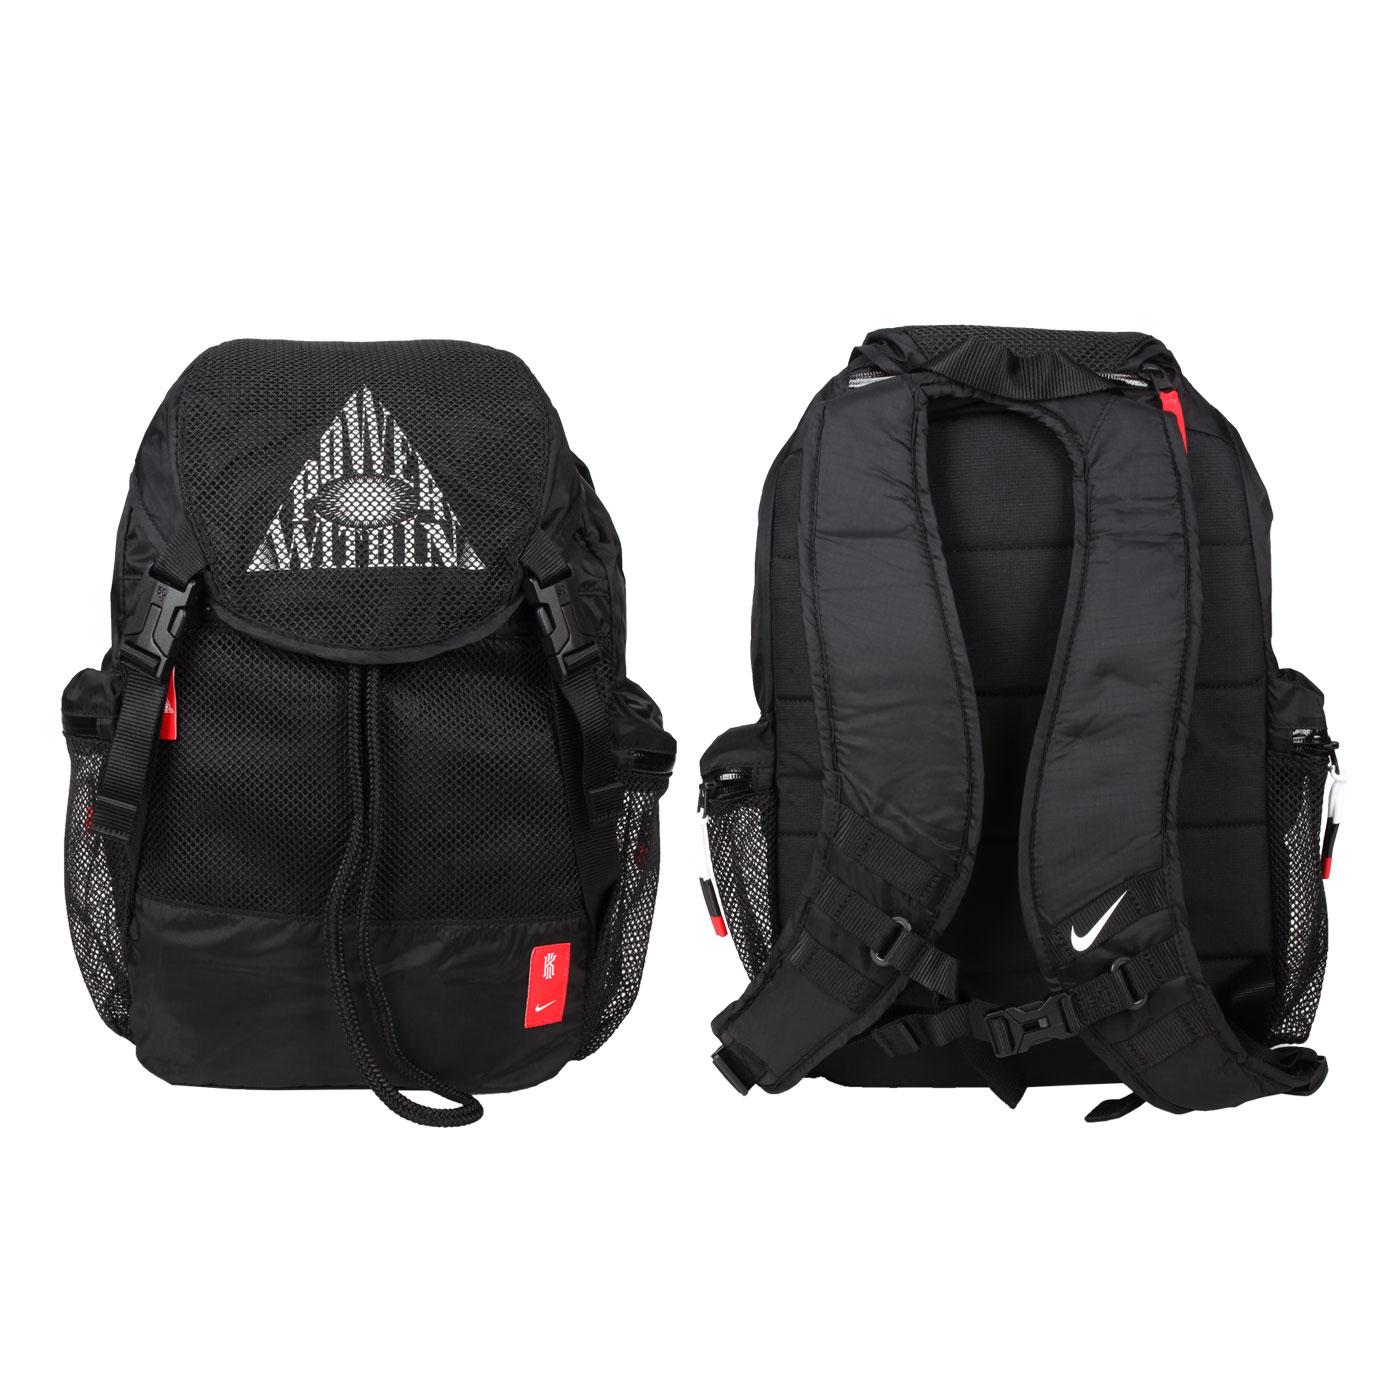 NIKE 大型後背包 CU3939-010 - 黑白